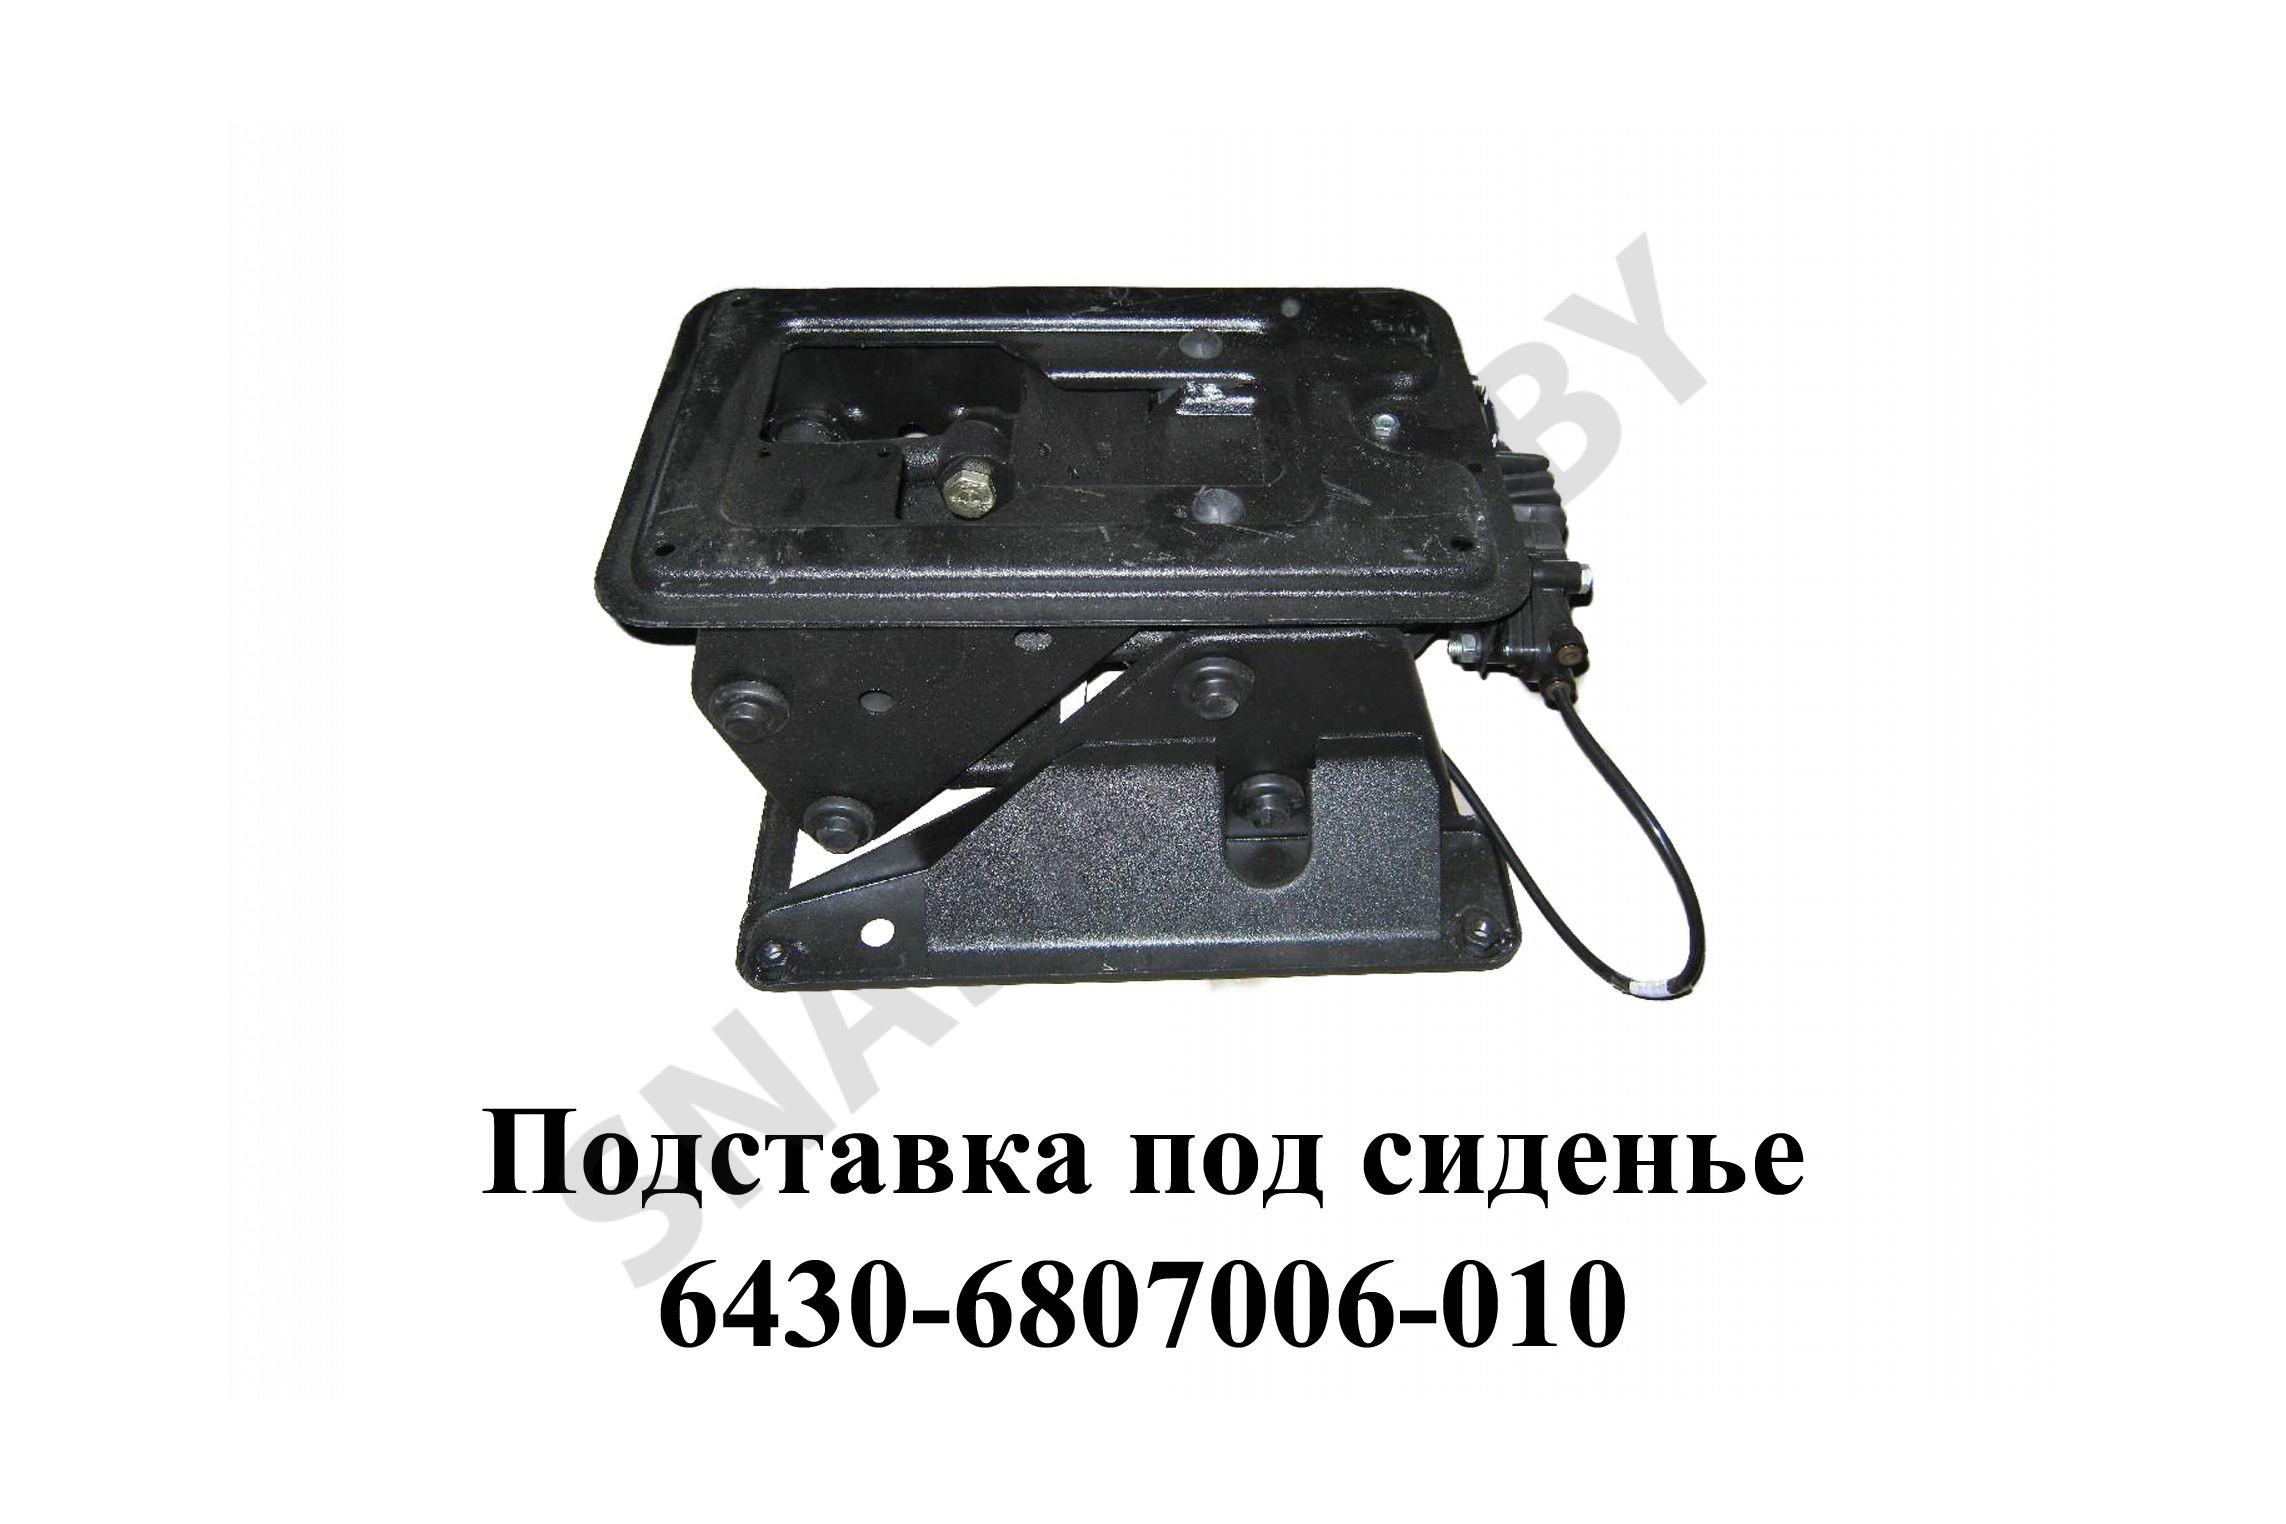 6430-6807006-010